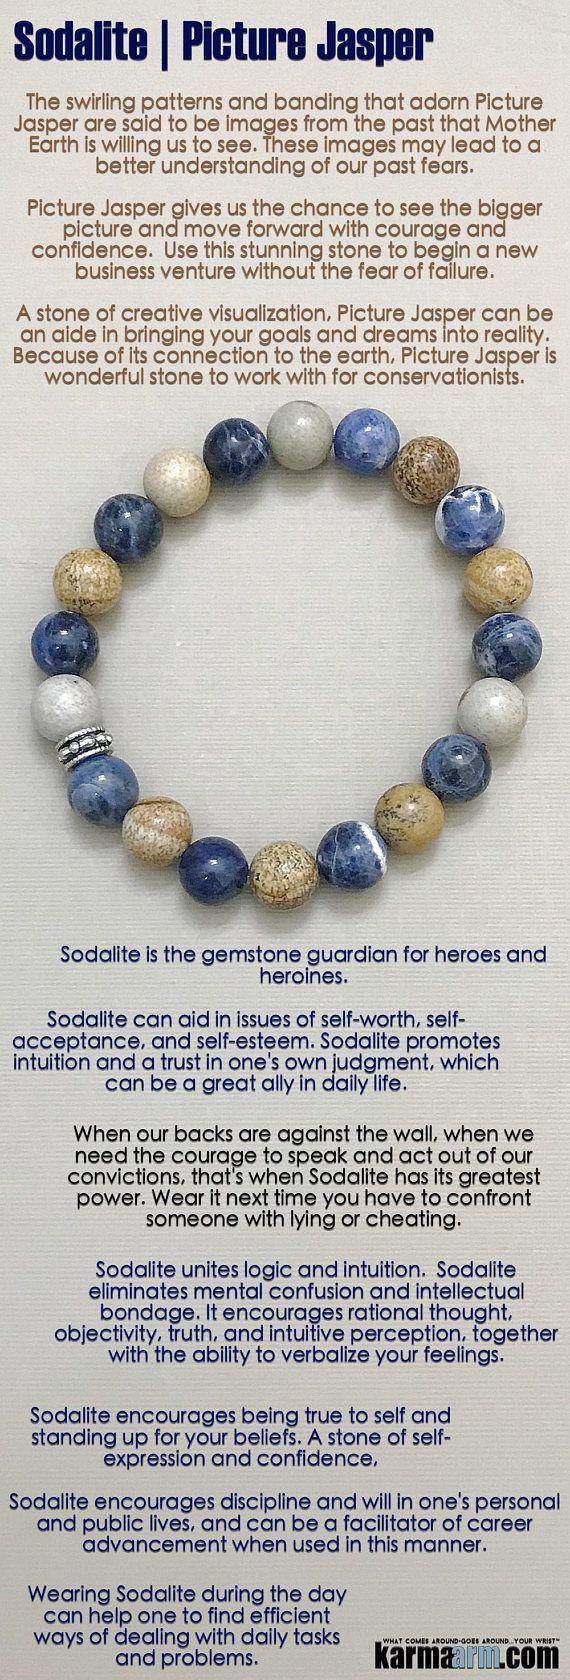 best สรอยขอมอชาย images on pinterest pearl bracelet yoga